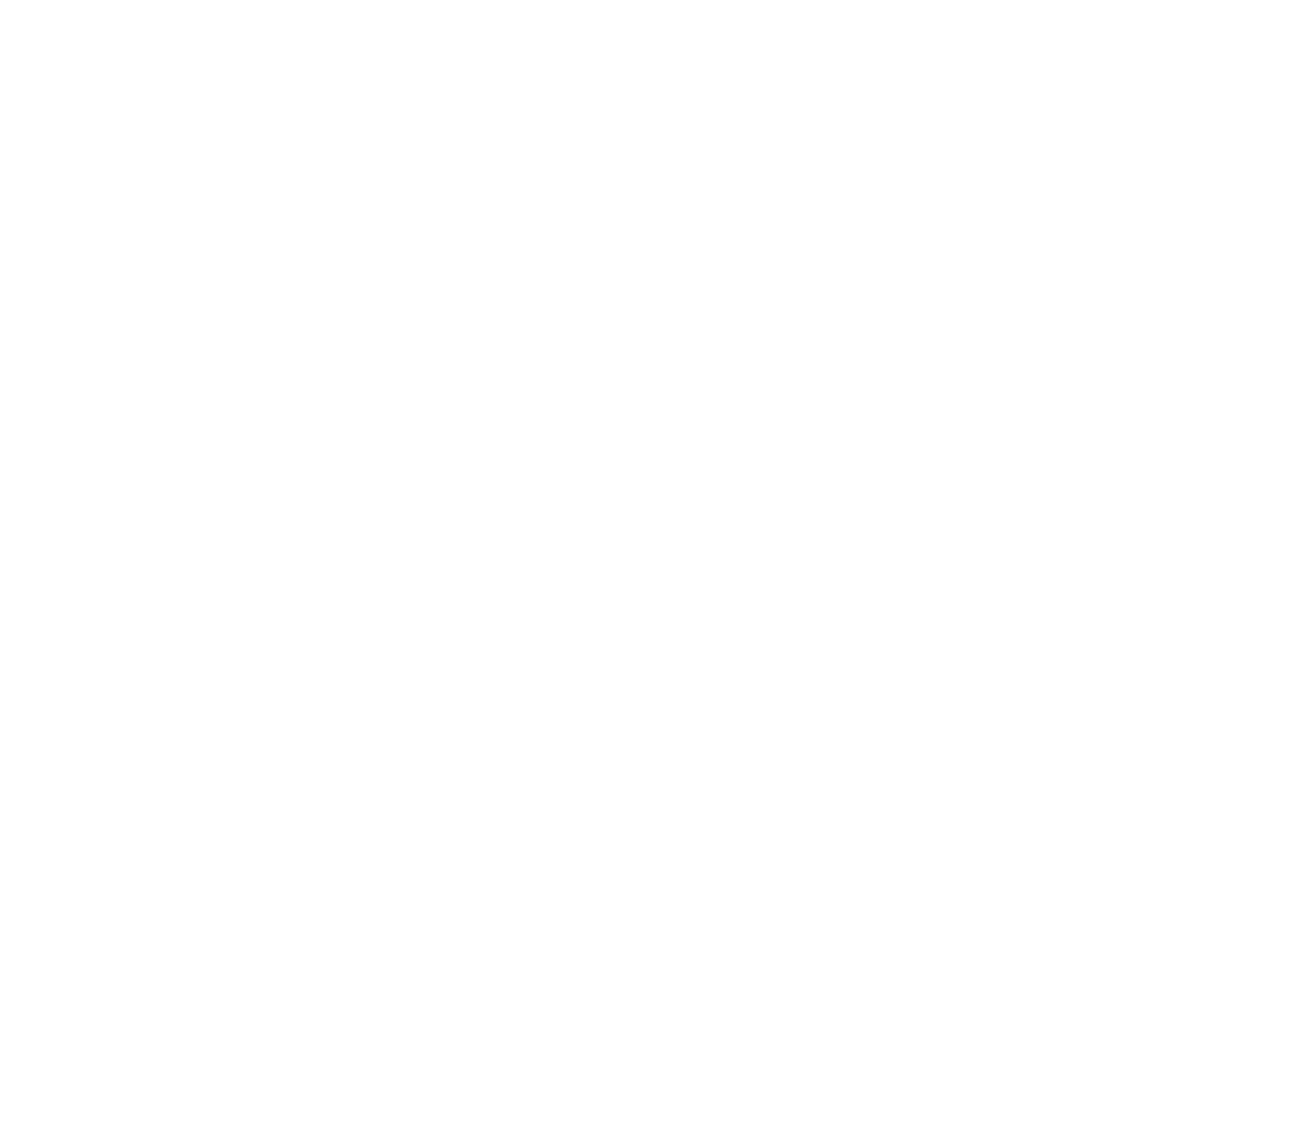 michiana-christian-camp-vertical-white.png